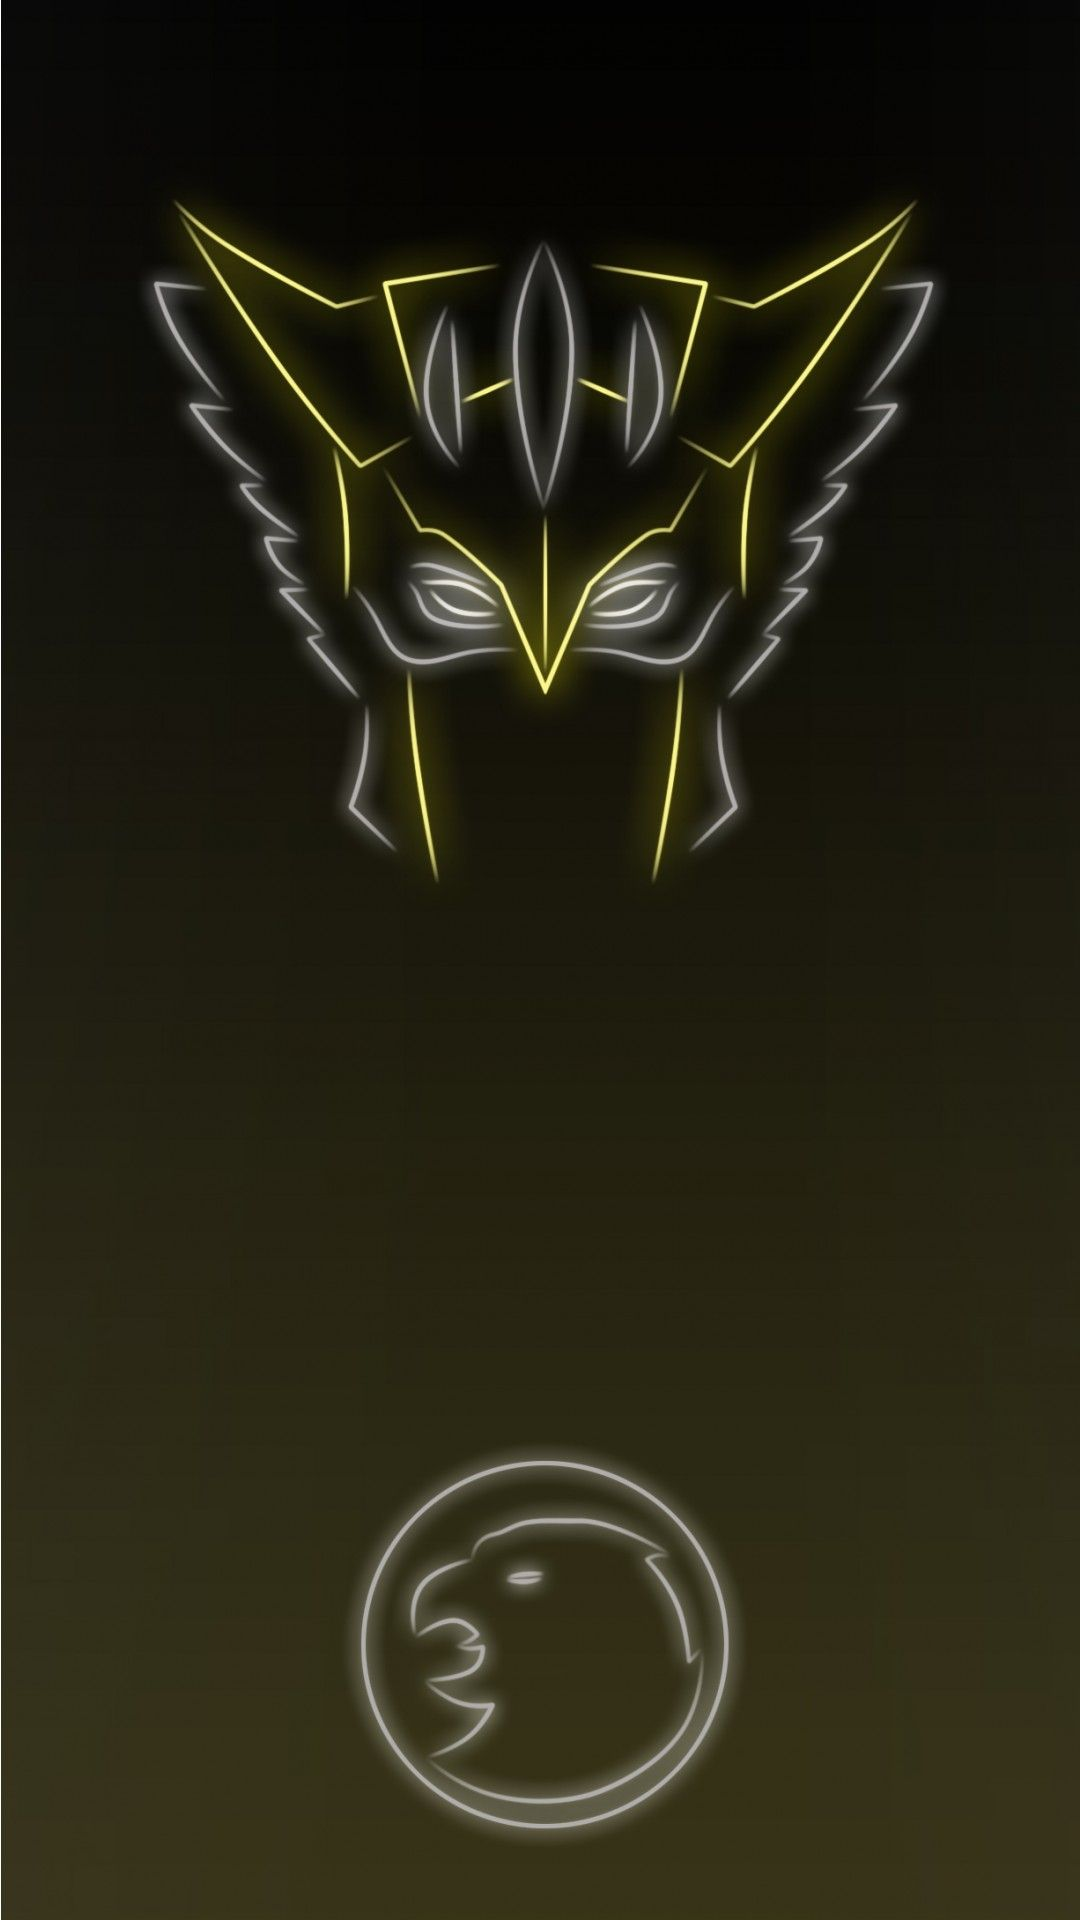 Neon Light Superheroine Hawkgirl Hawkgirl Superhero Hawkman